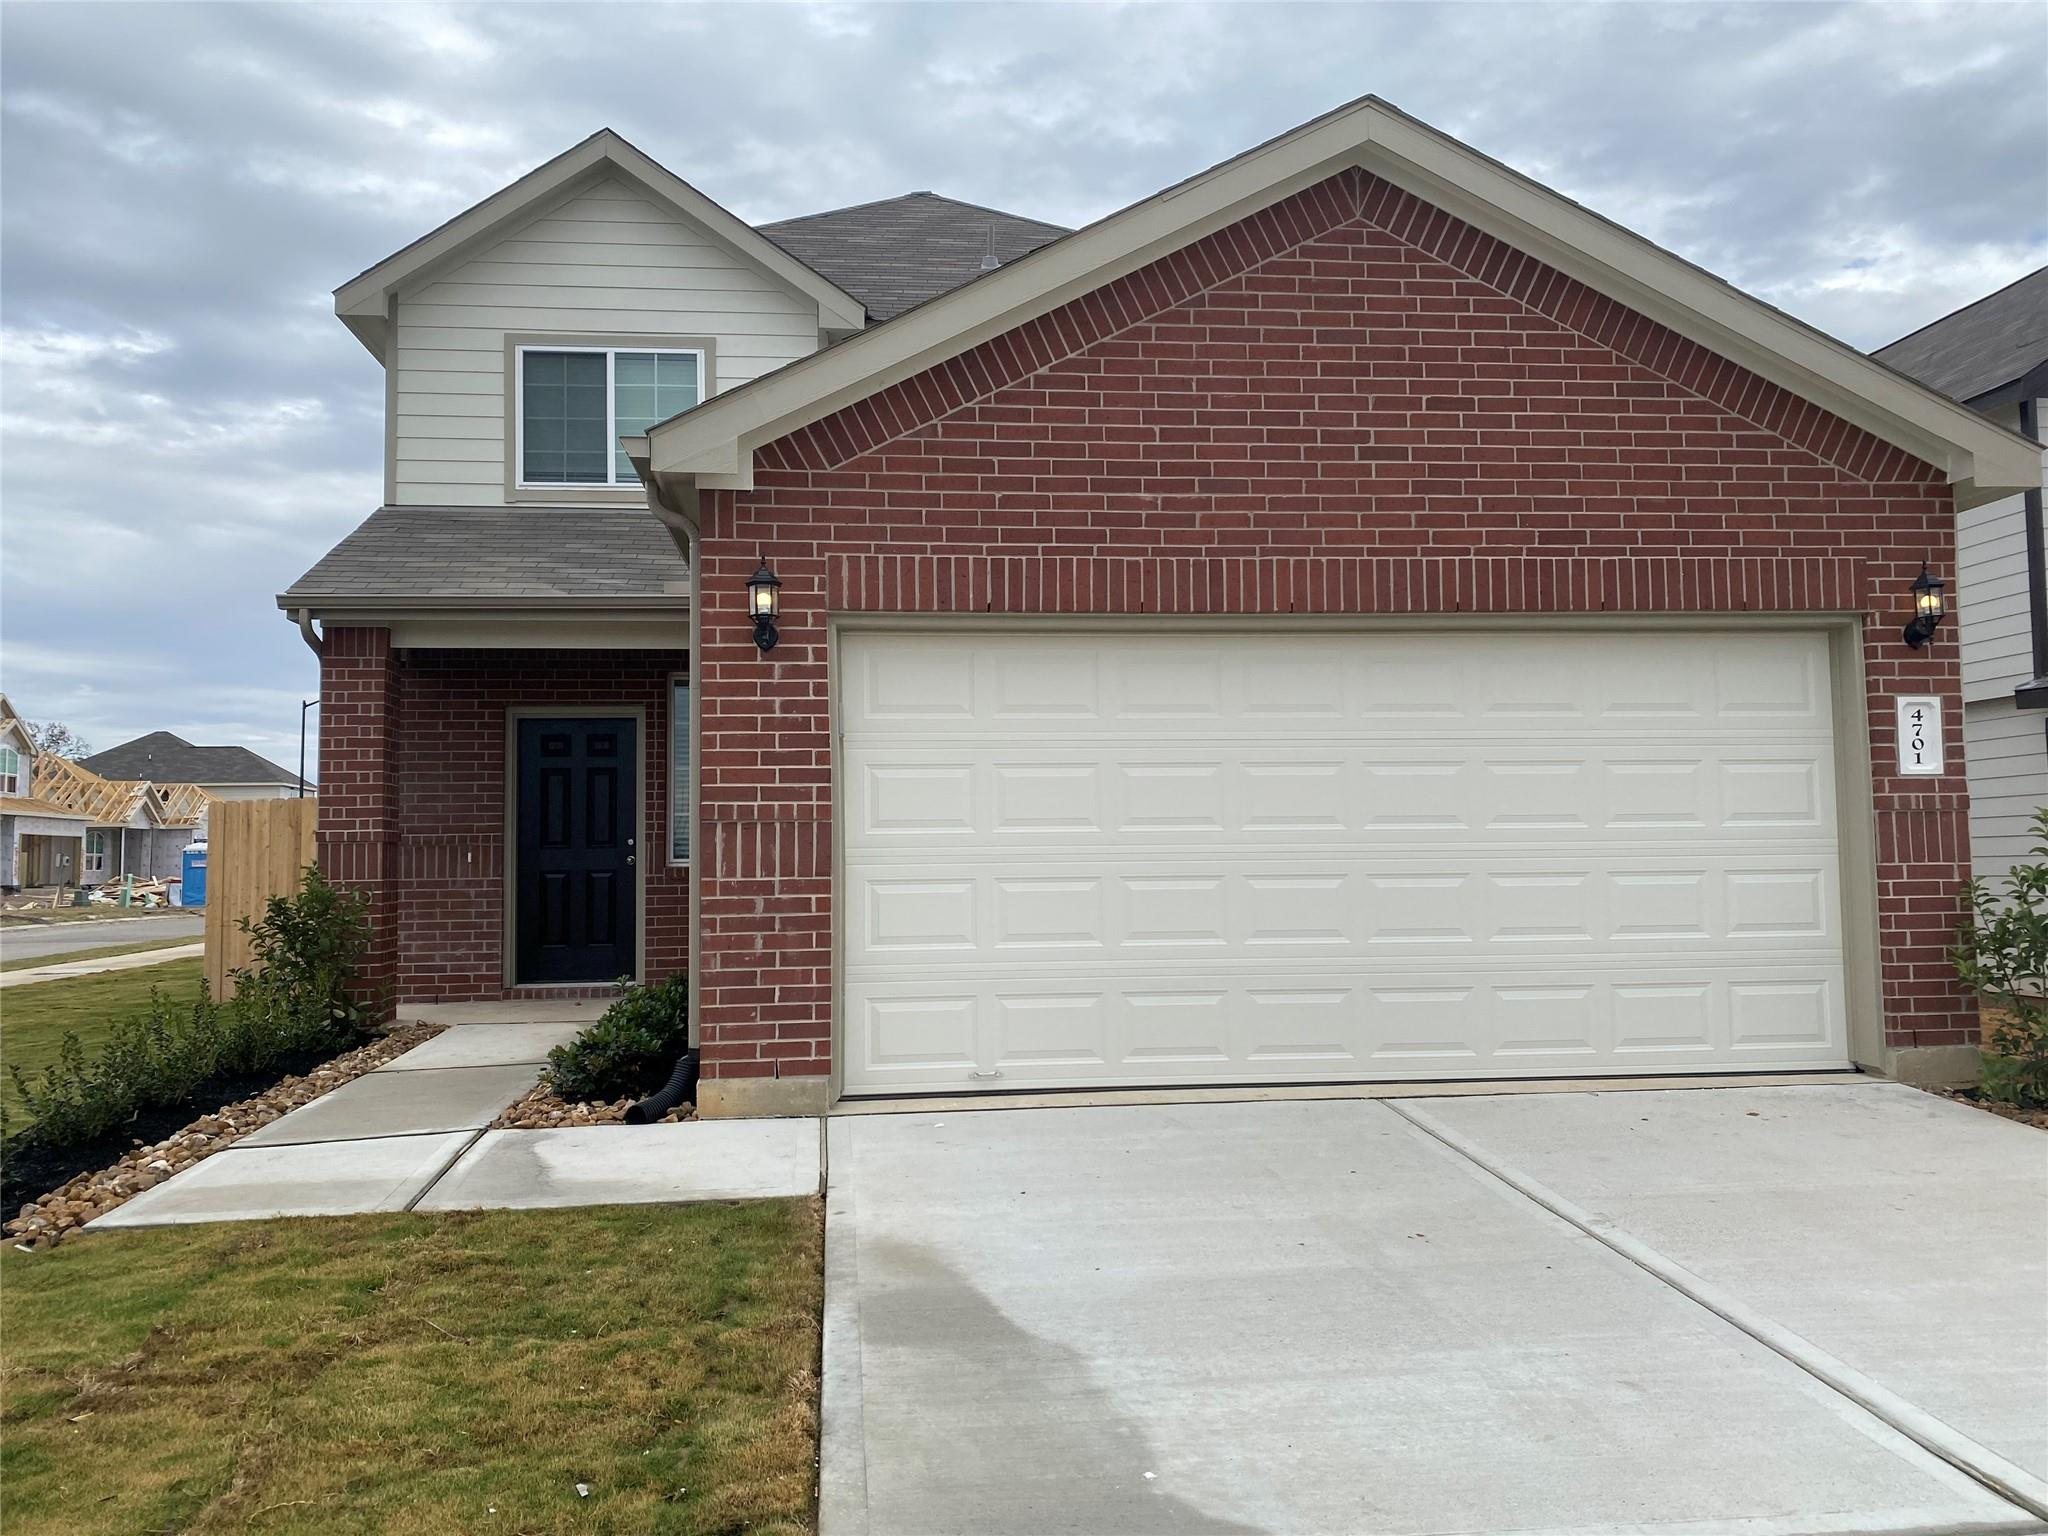 4701 Coyotillo Way Property Photo - Bryan, TX real estate listing